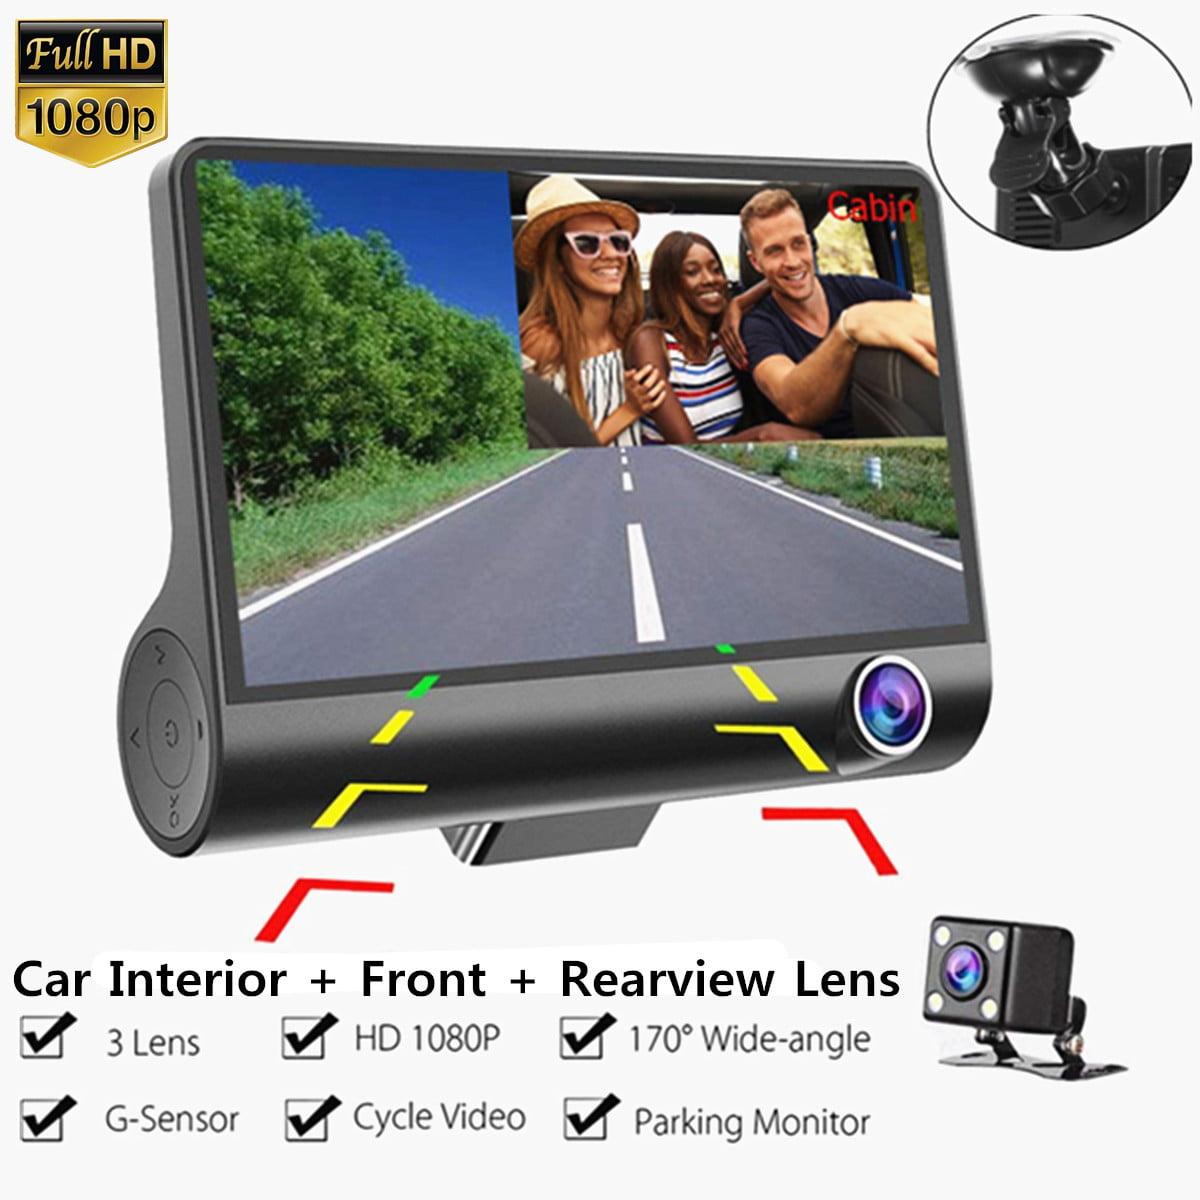 License Plate Car Back Up Camera Safety System Full Color 170 Degree